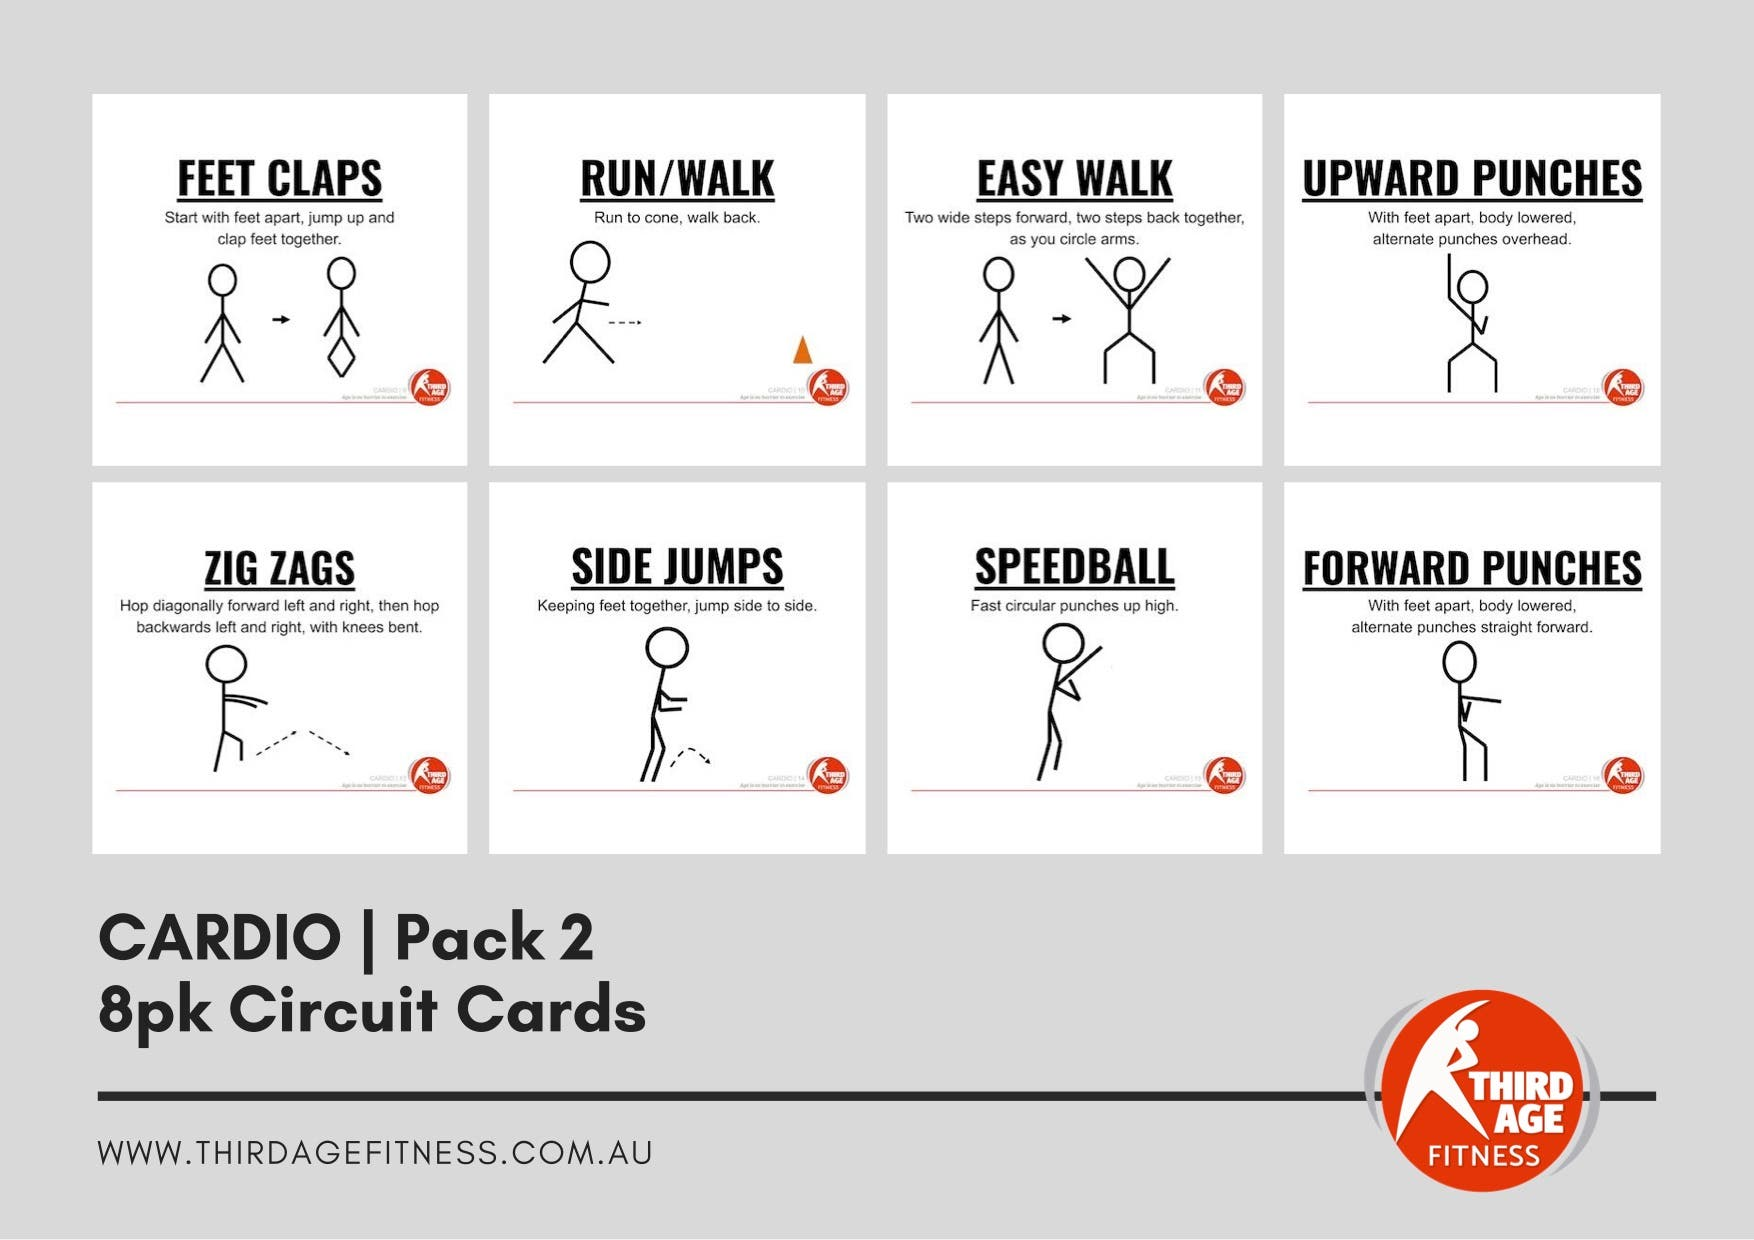 Circuit Cards - Cardio Pack 2